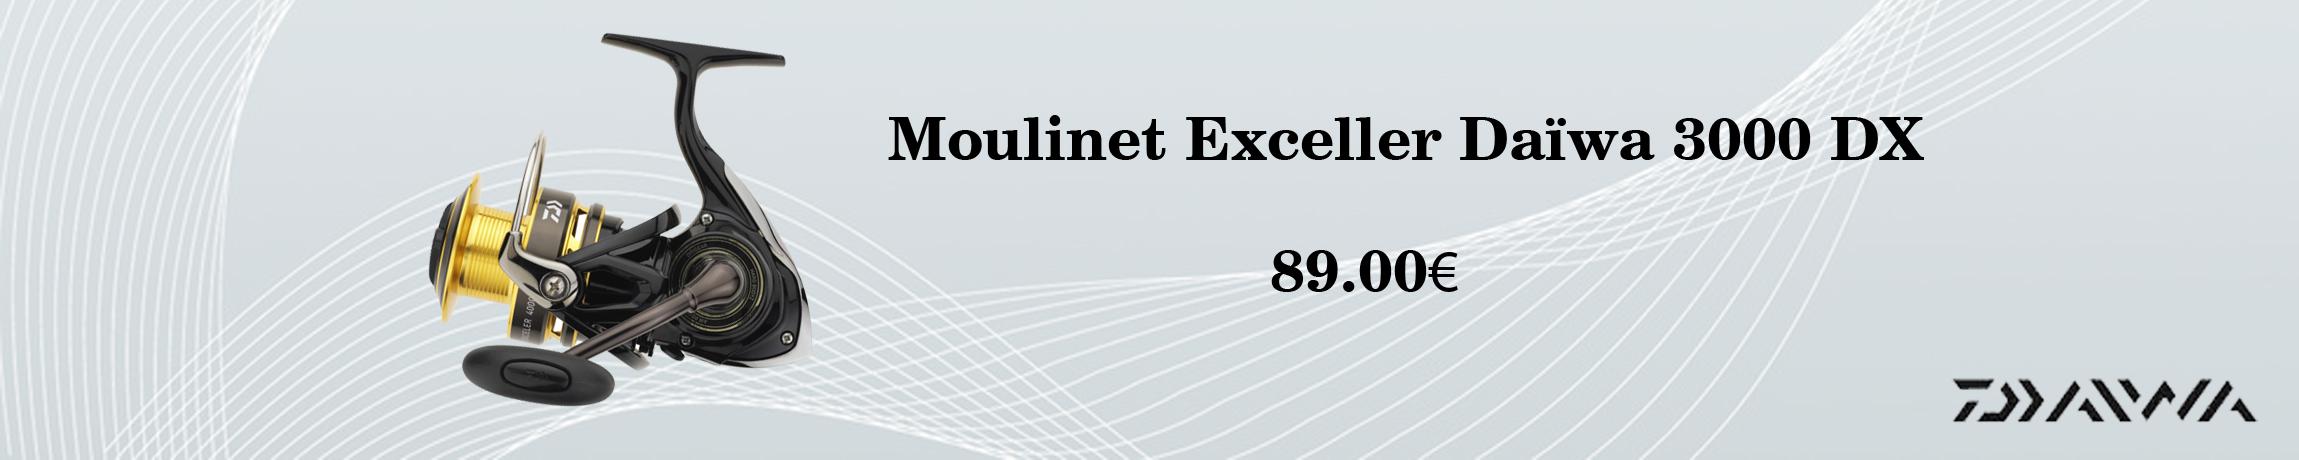 moulinet_exceller_daiwa